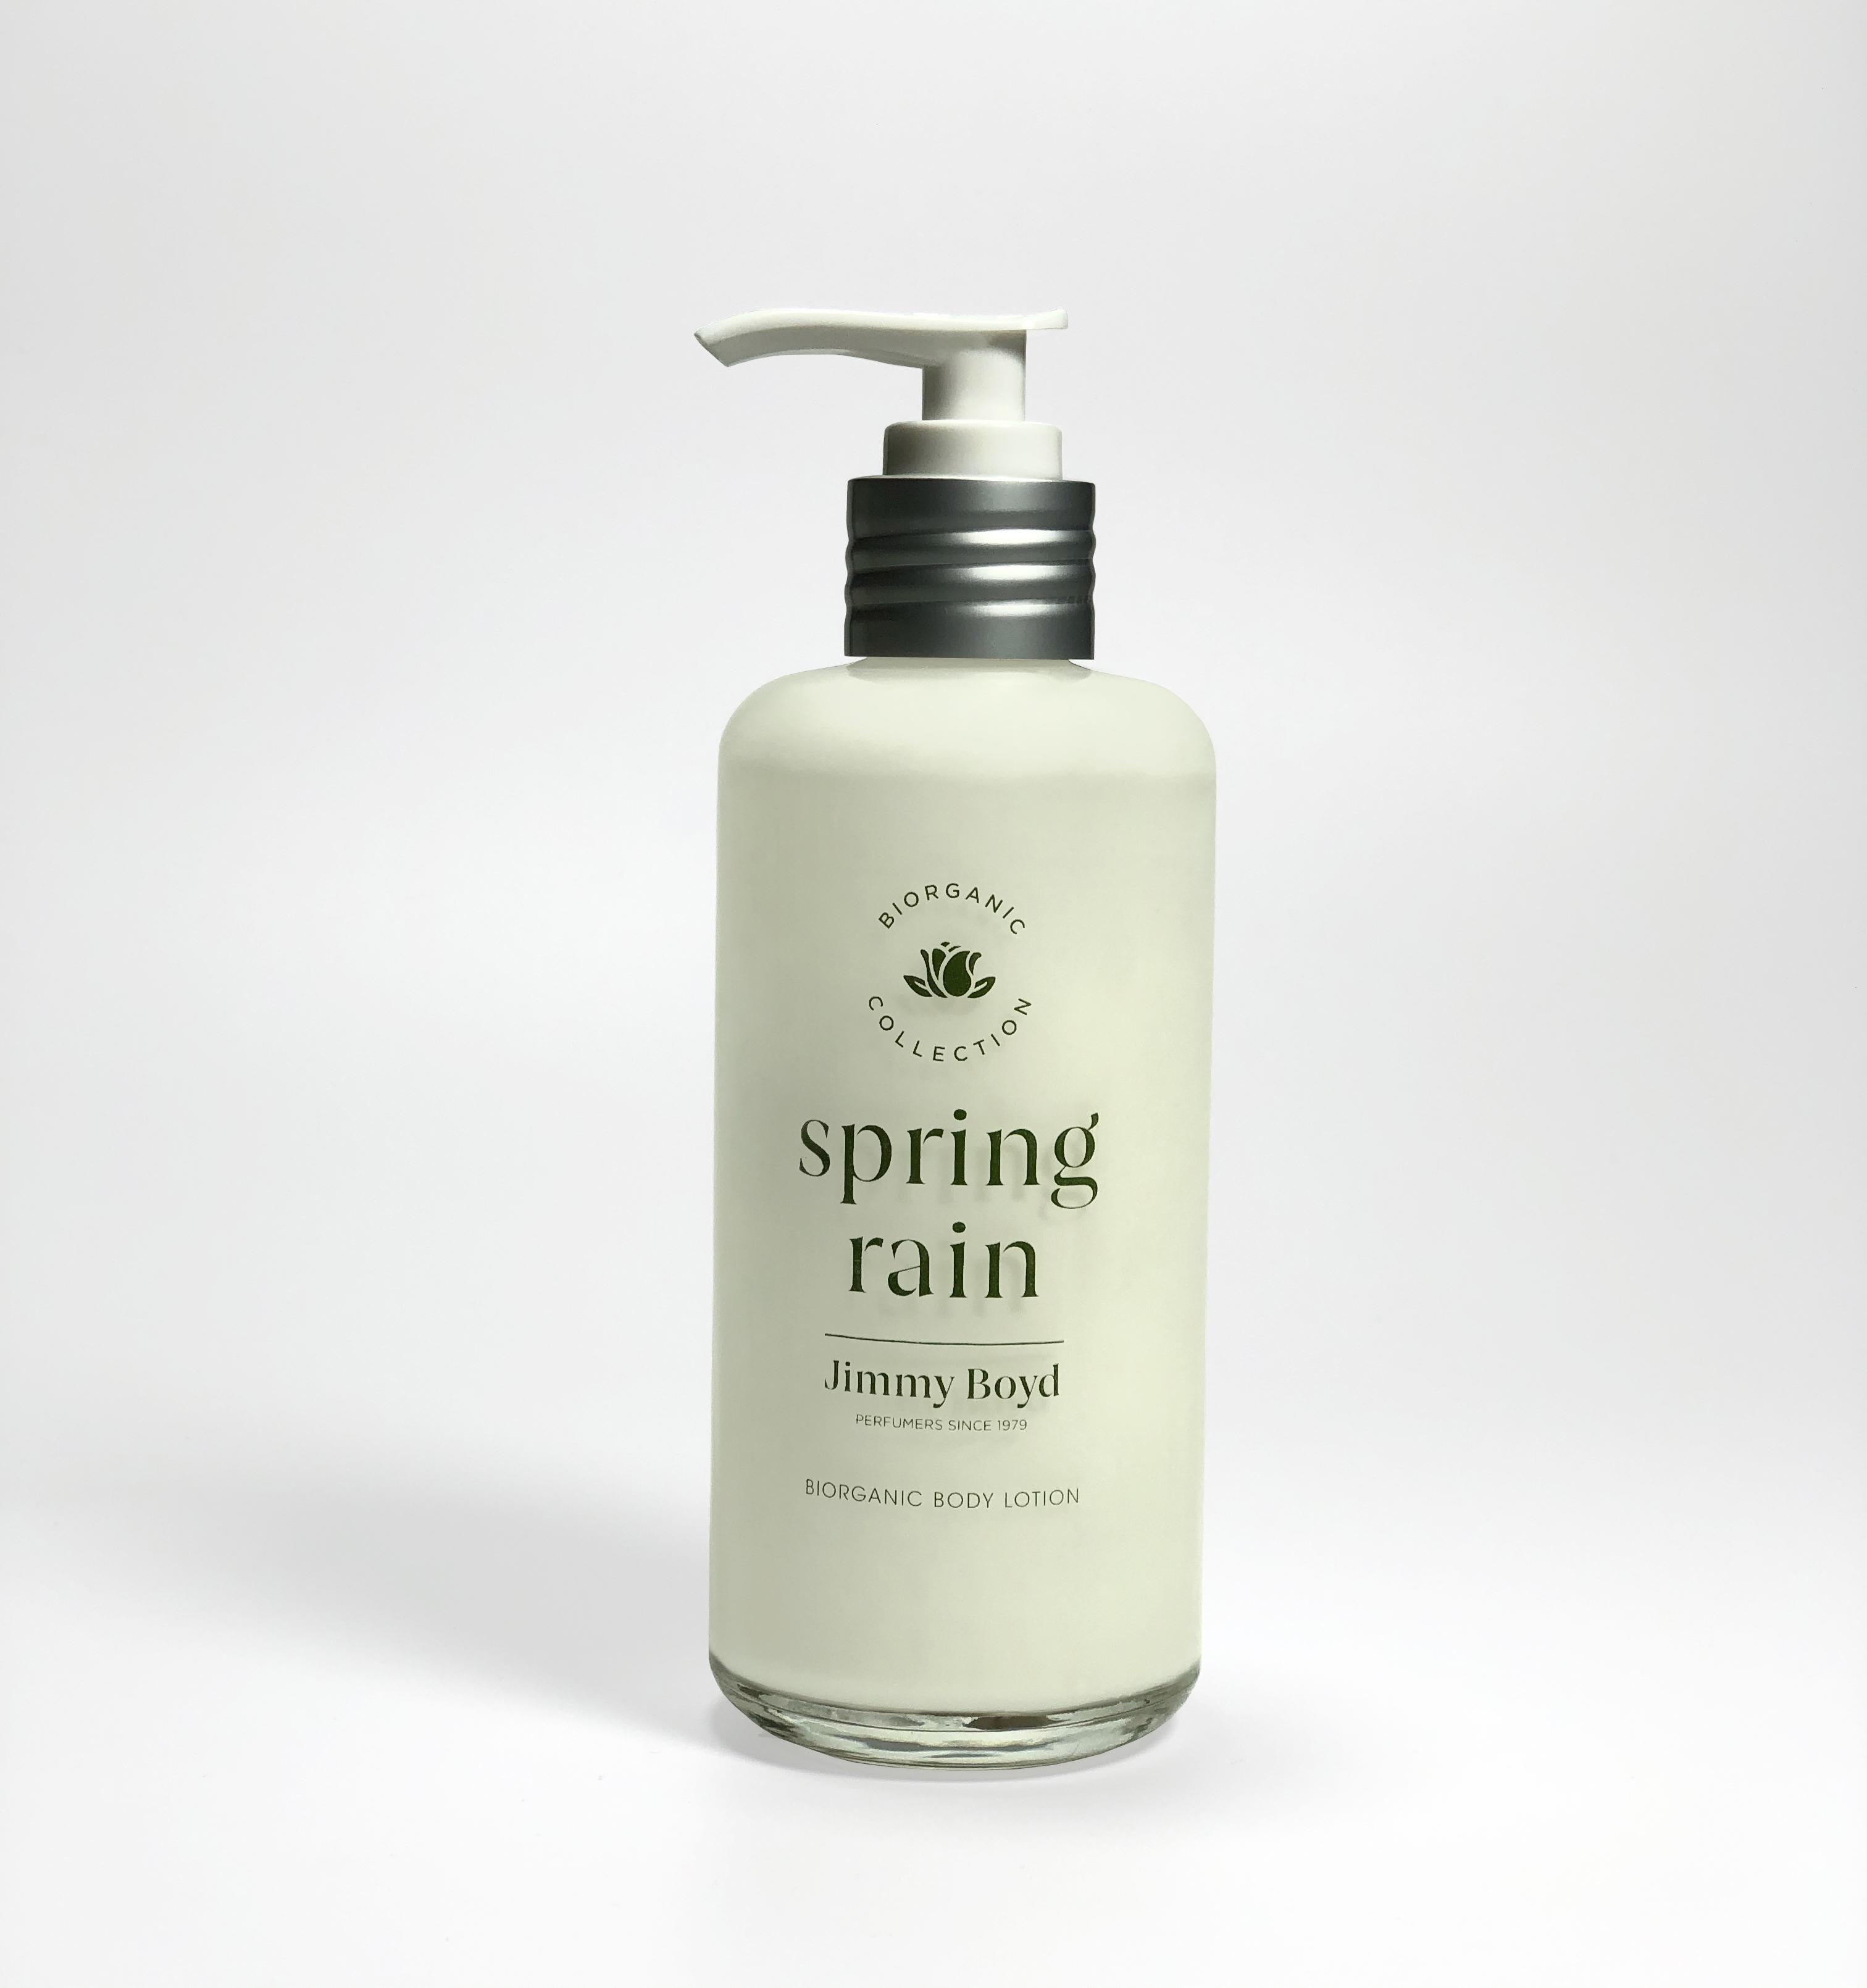 SPRING RAIN VARTALOEMULSIO, 200ml